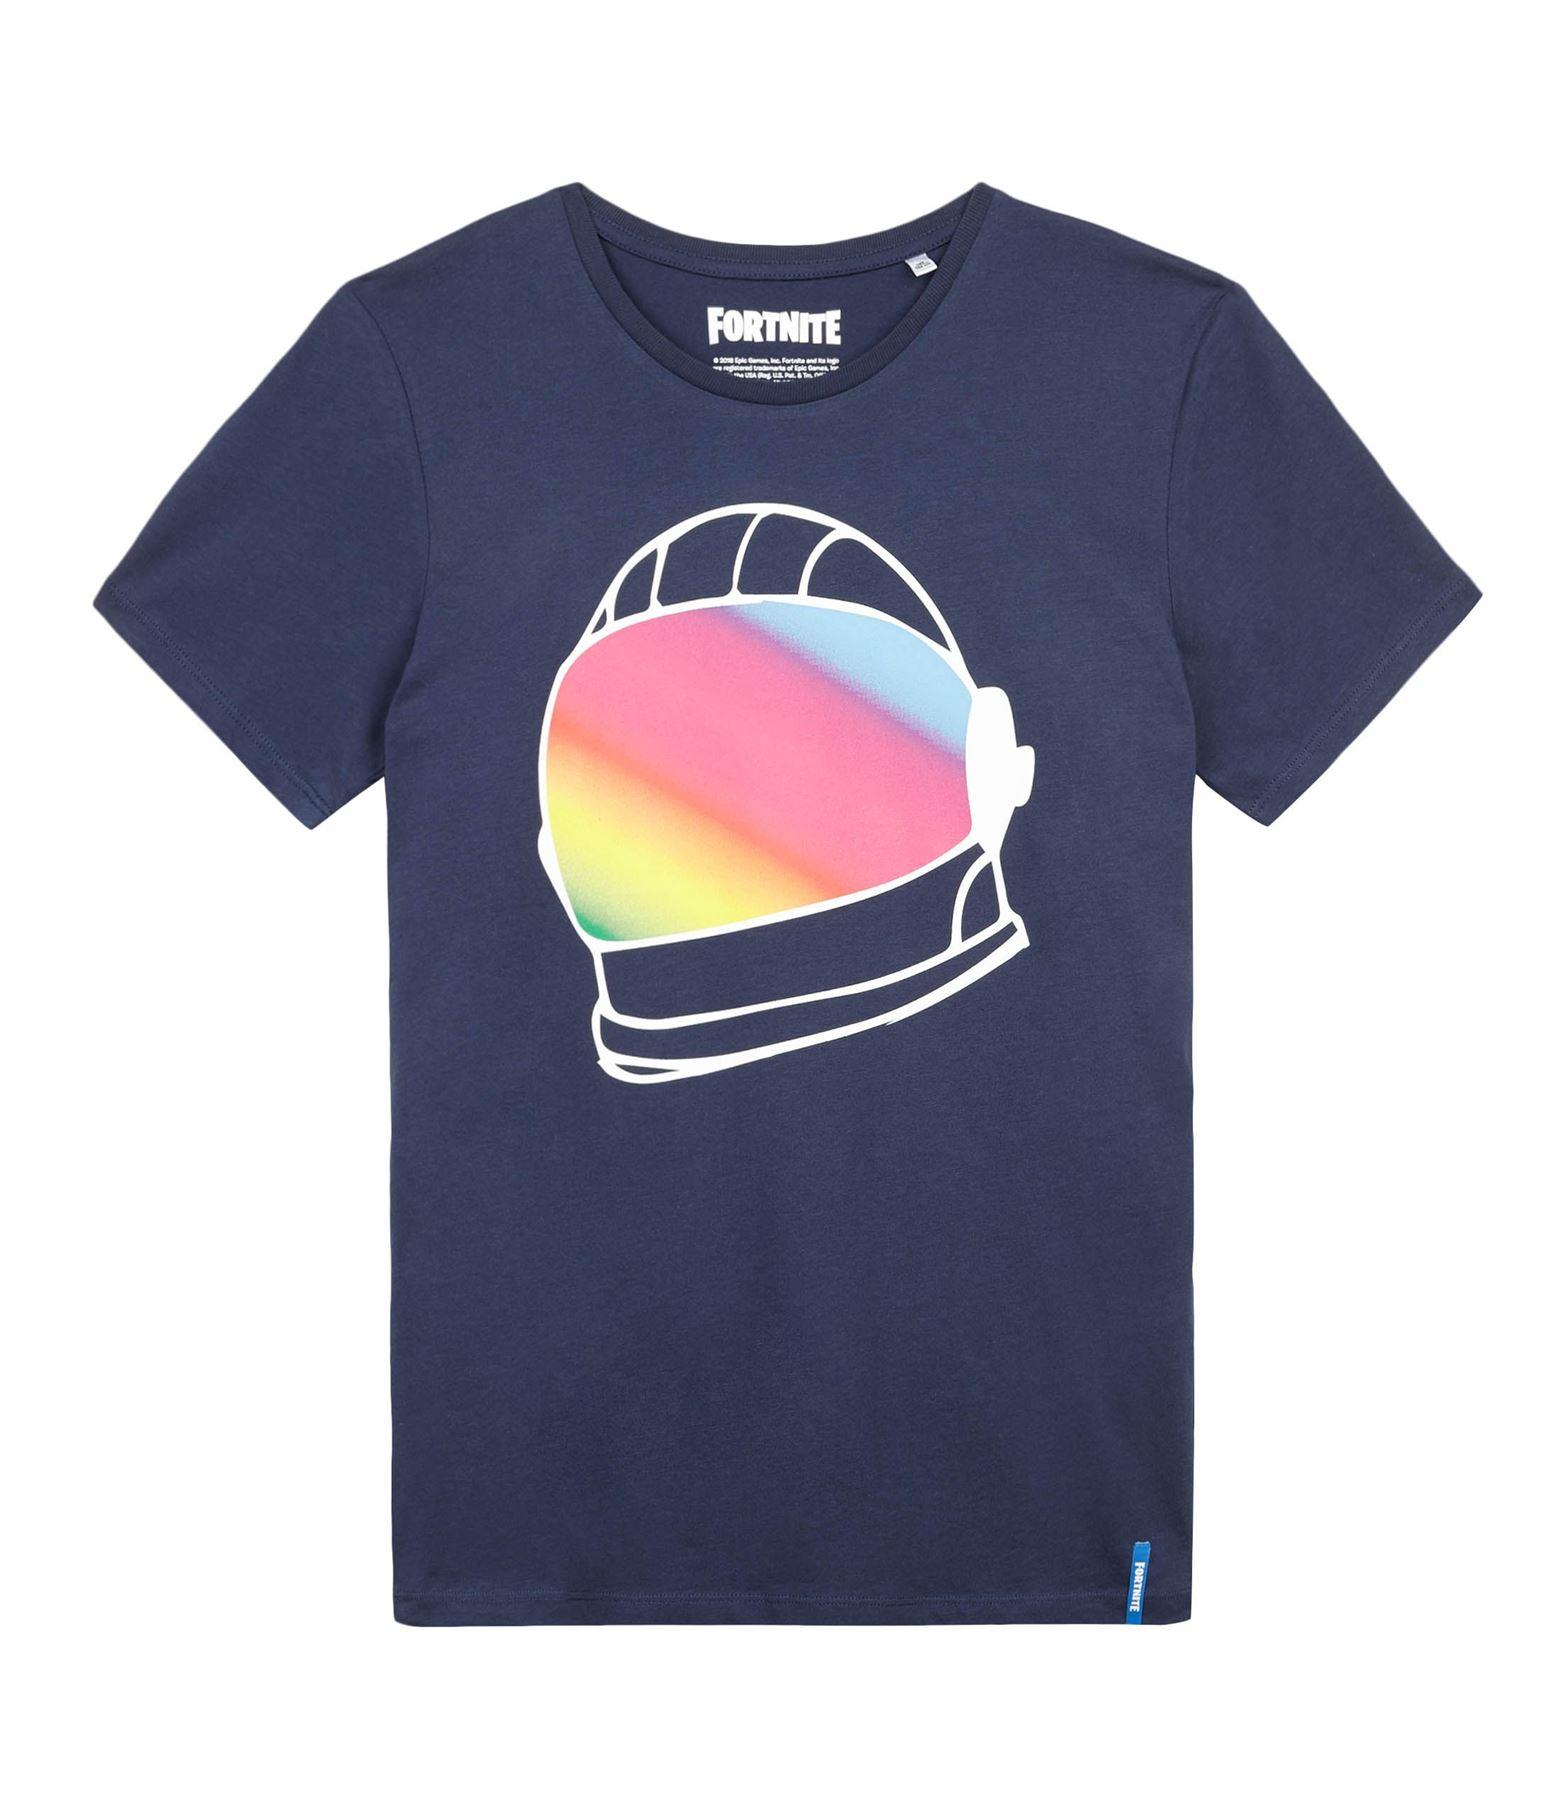 Fortnite Boys Teenagers Speed Short Sleeve T Shirt 9-16 Years